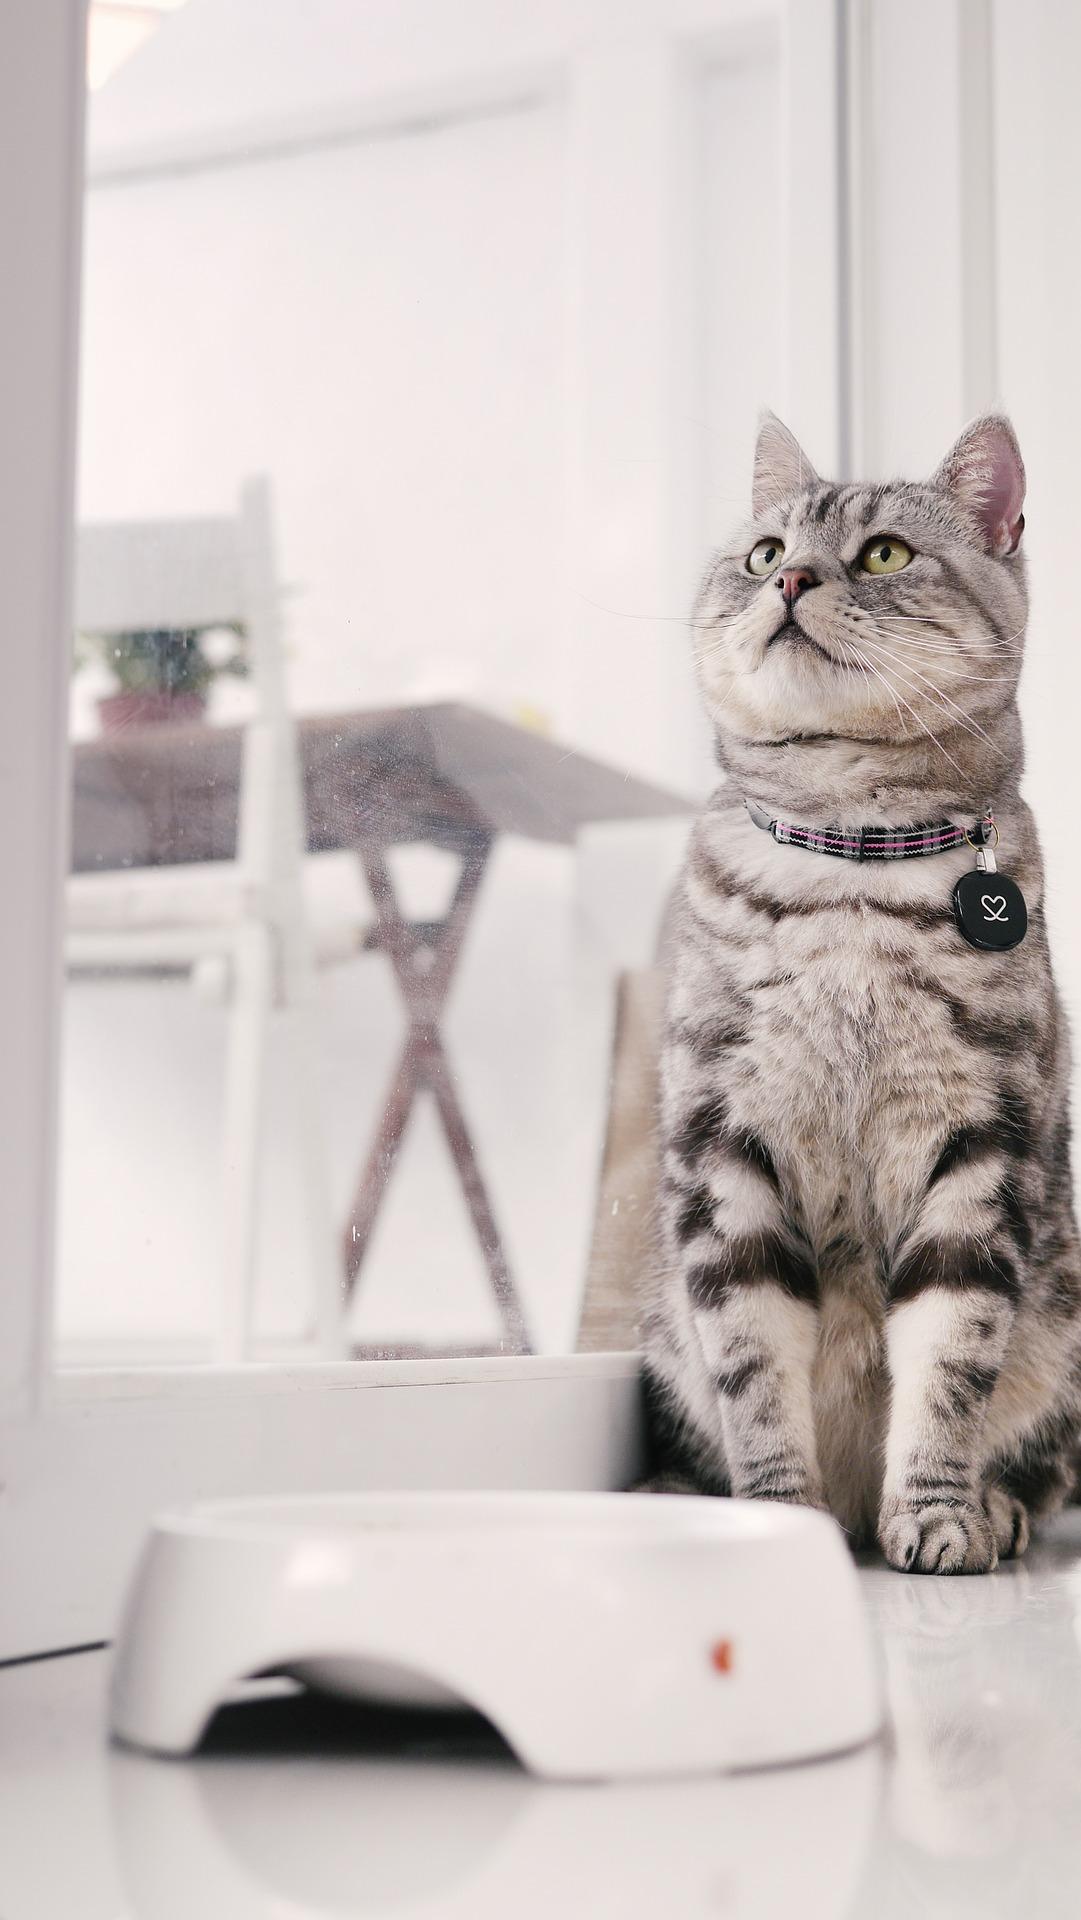 cat 703408 1920 - Conheça o gato American Shorthair